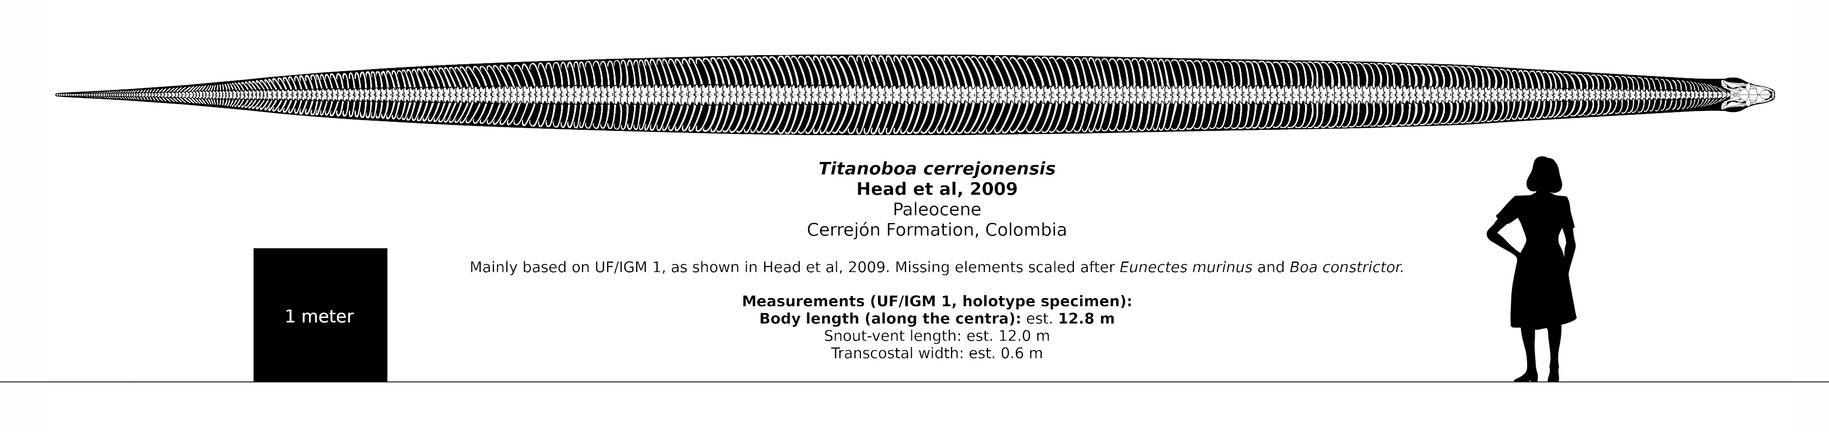 Titanoboa cerrejonensis skeletal reconstruction.